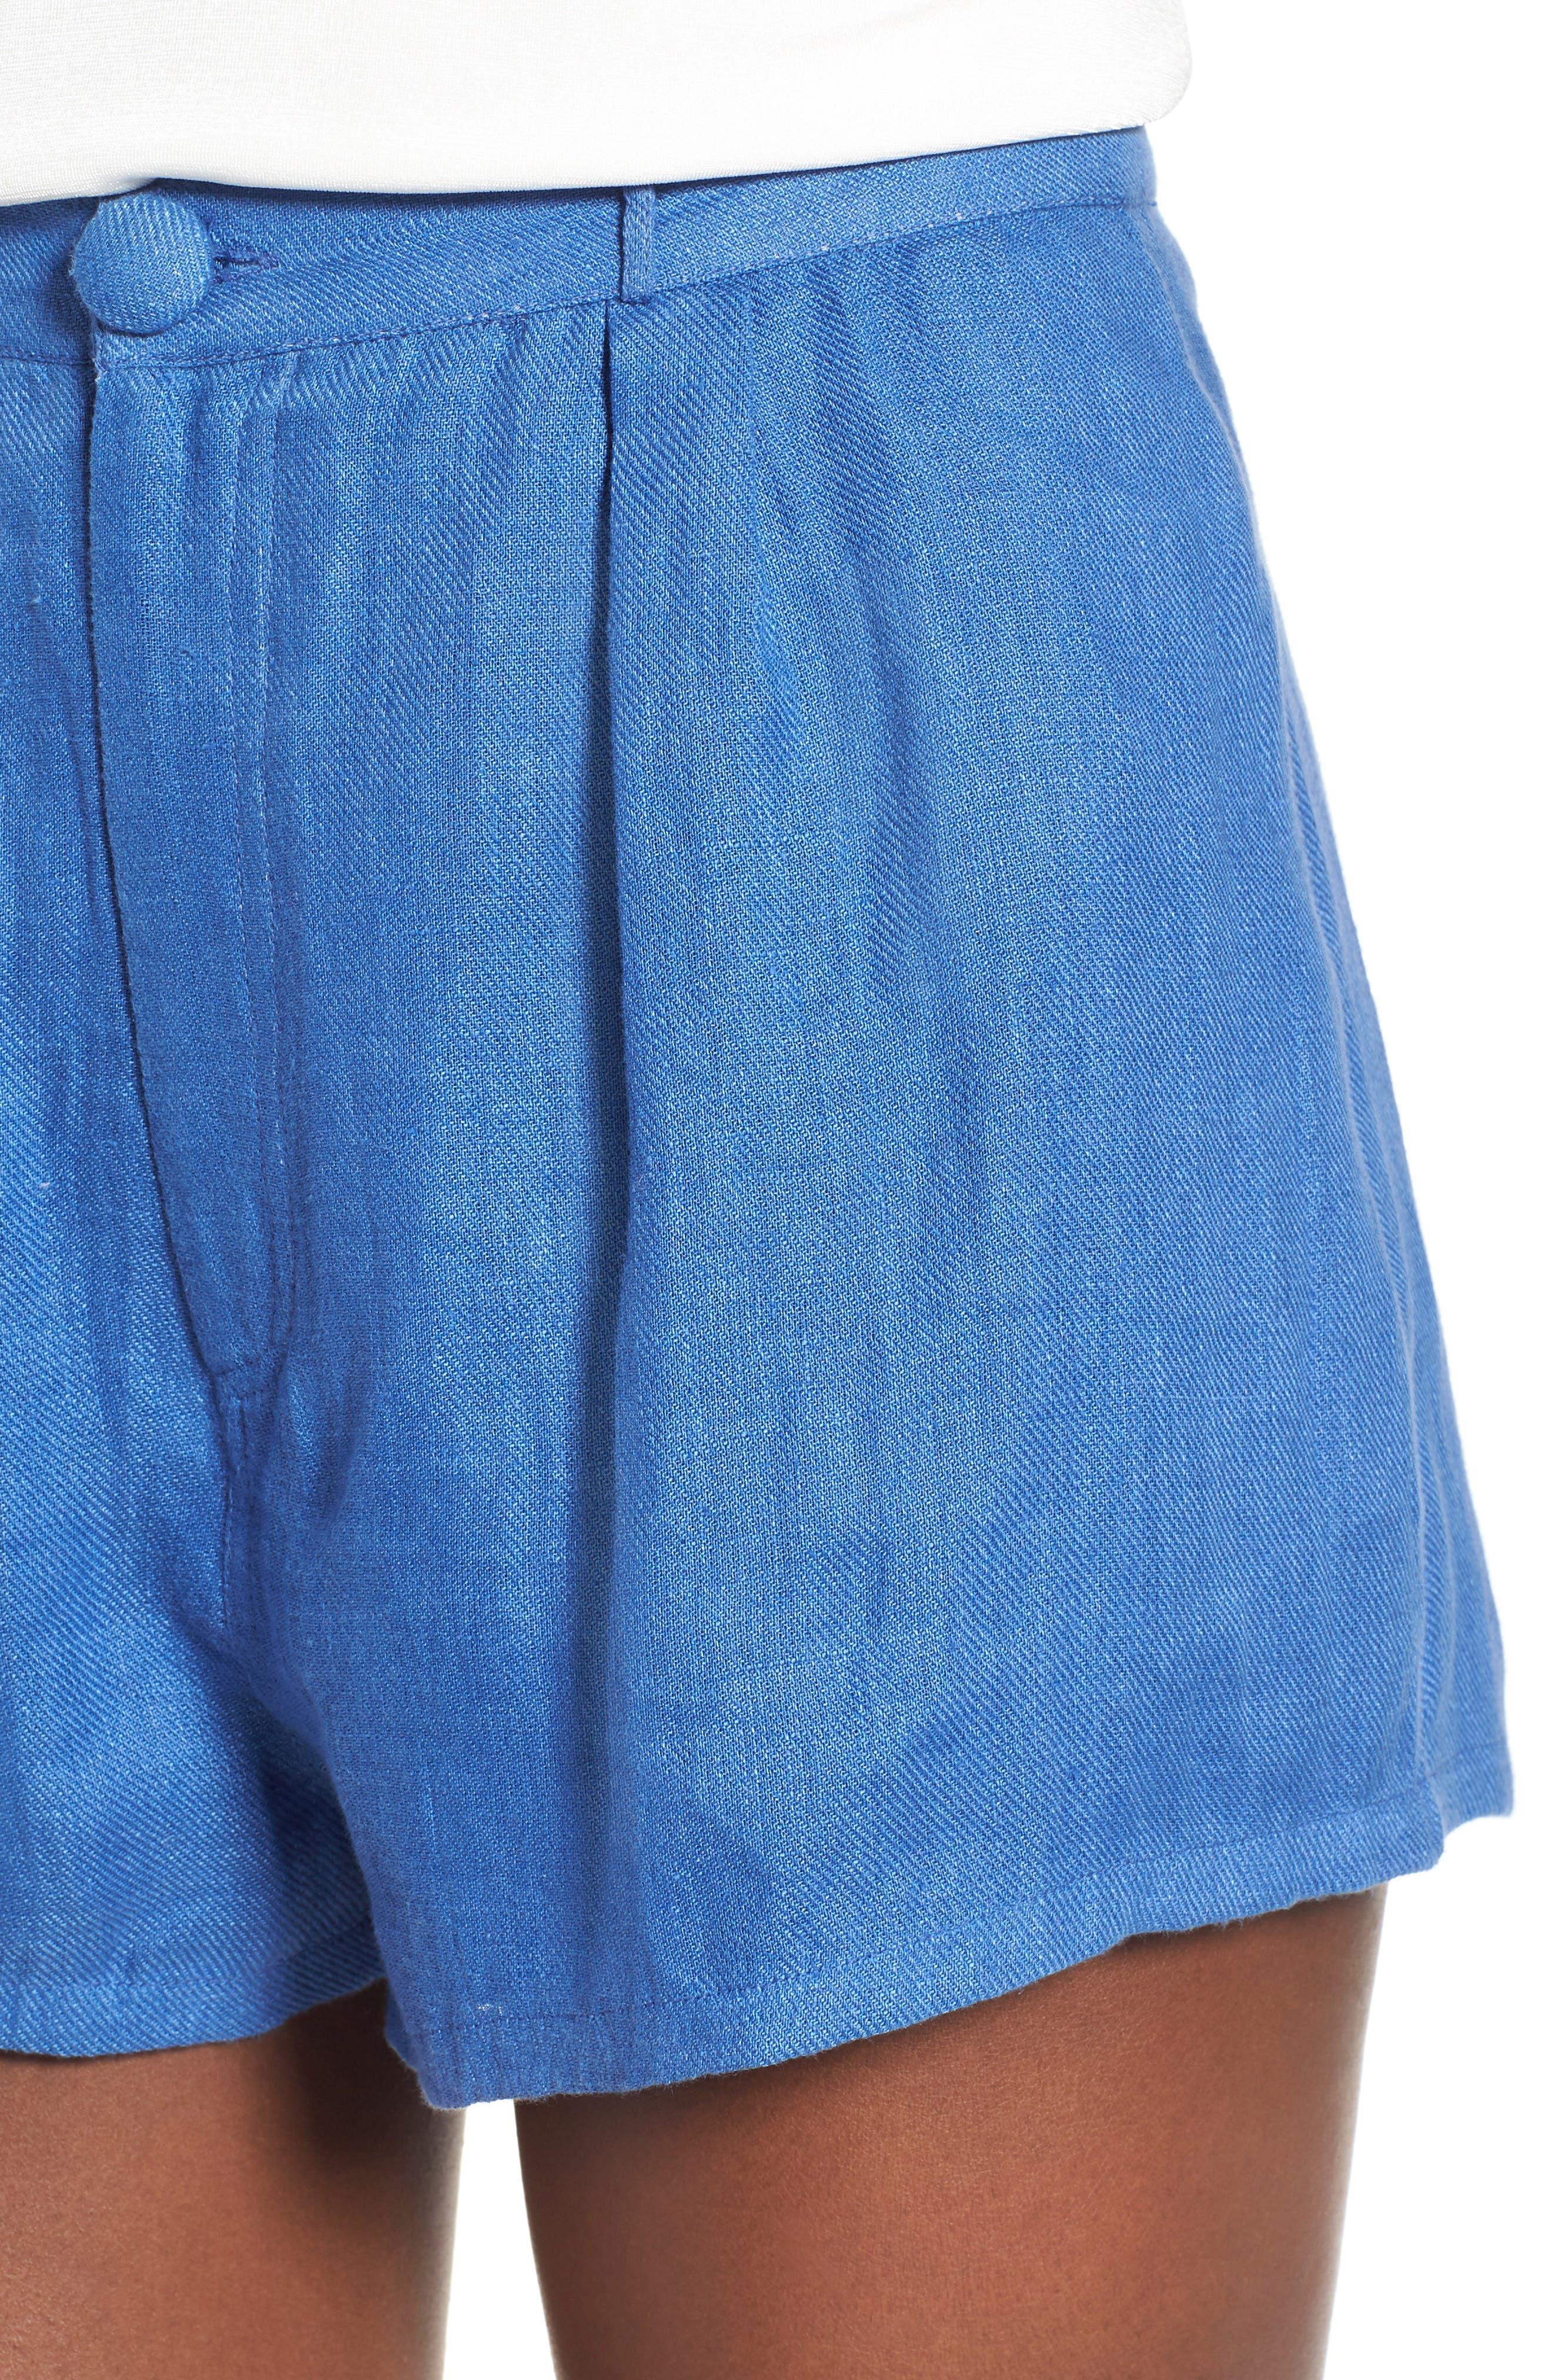 Jordy High Waist Shorts,                             Alternate thumbnail 5, color,                             Blue